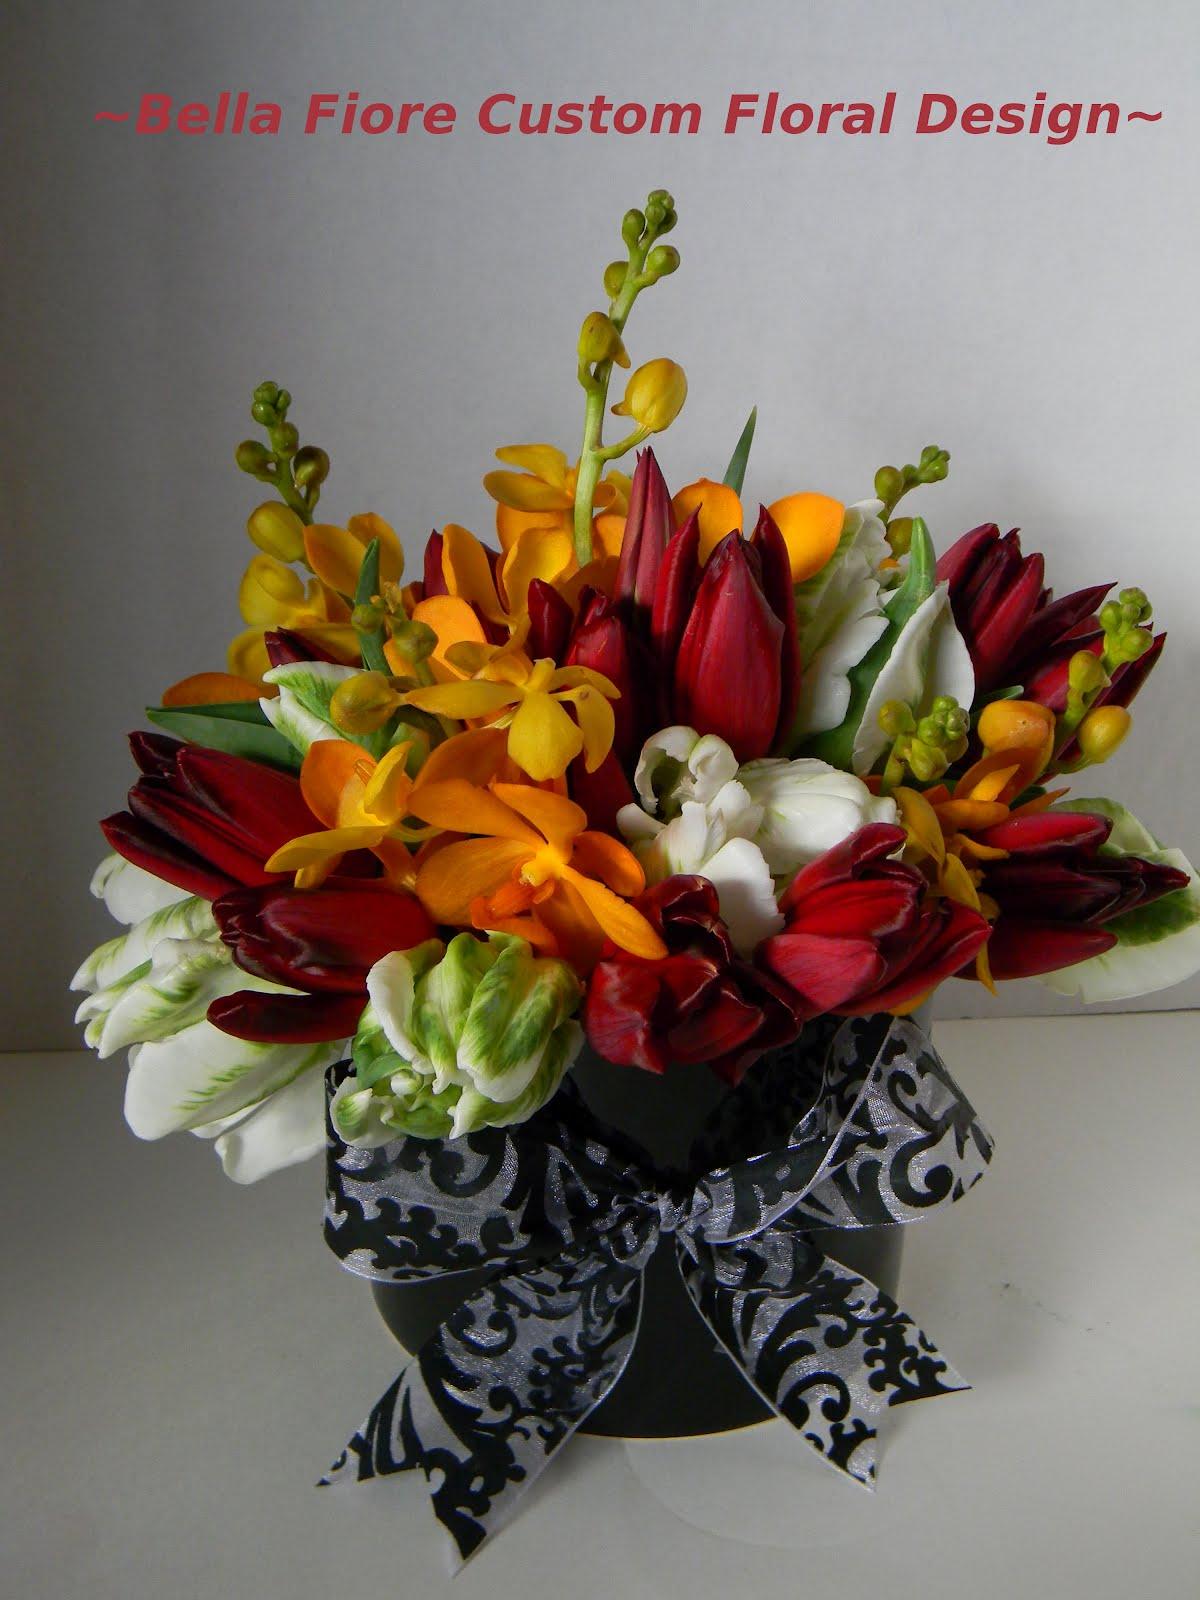 About Bella Fiore Custom Floral Design